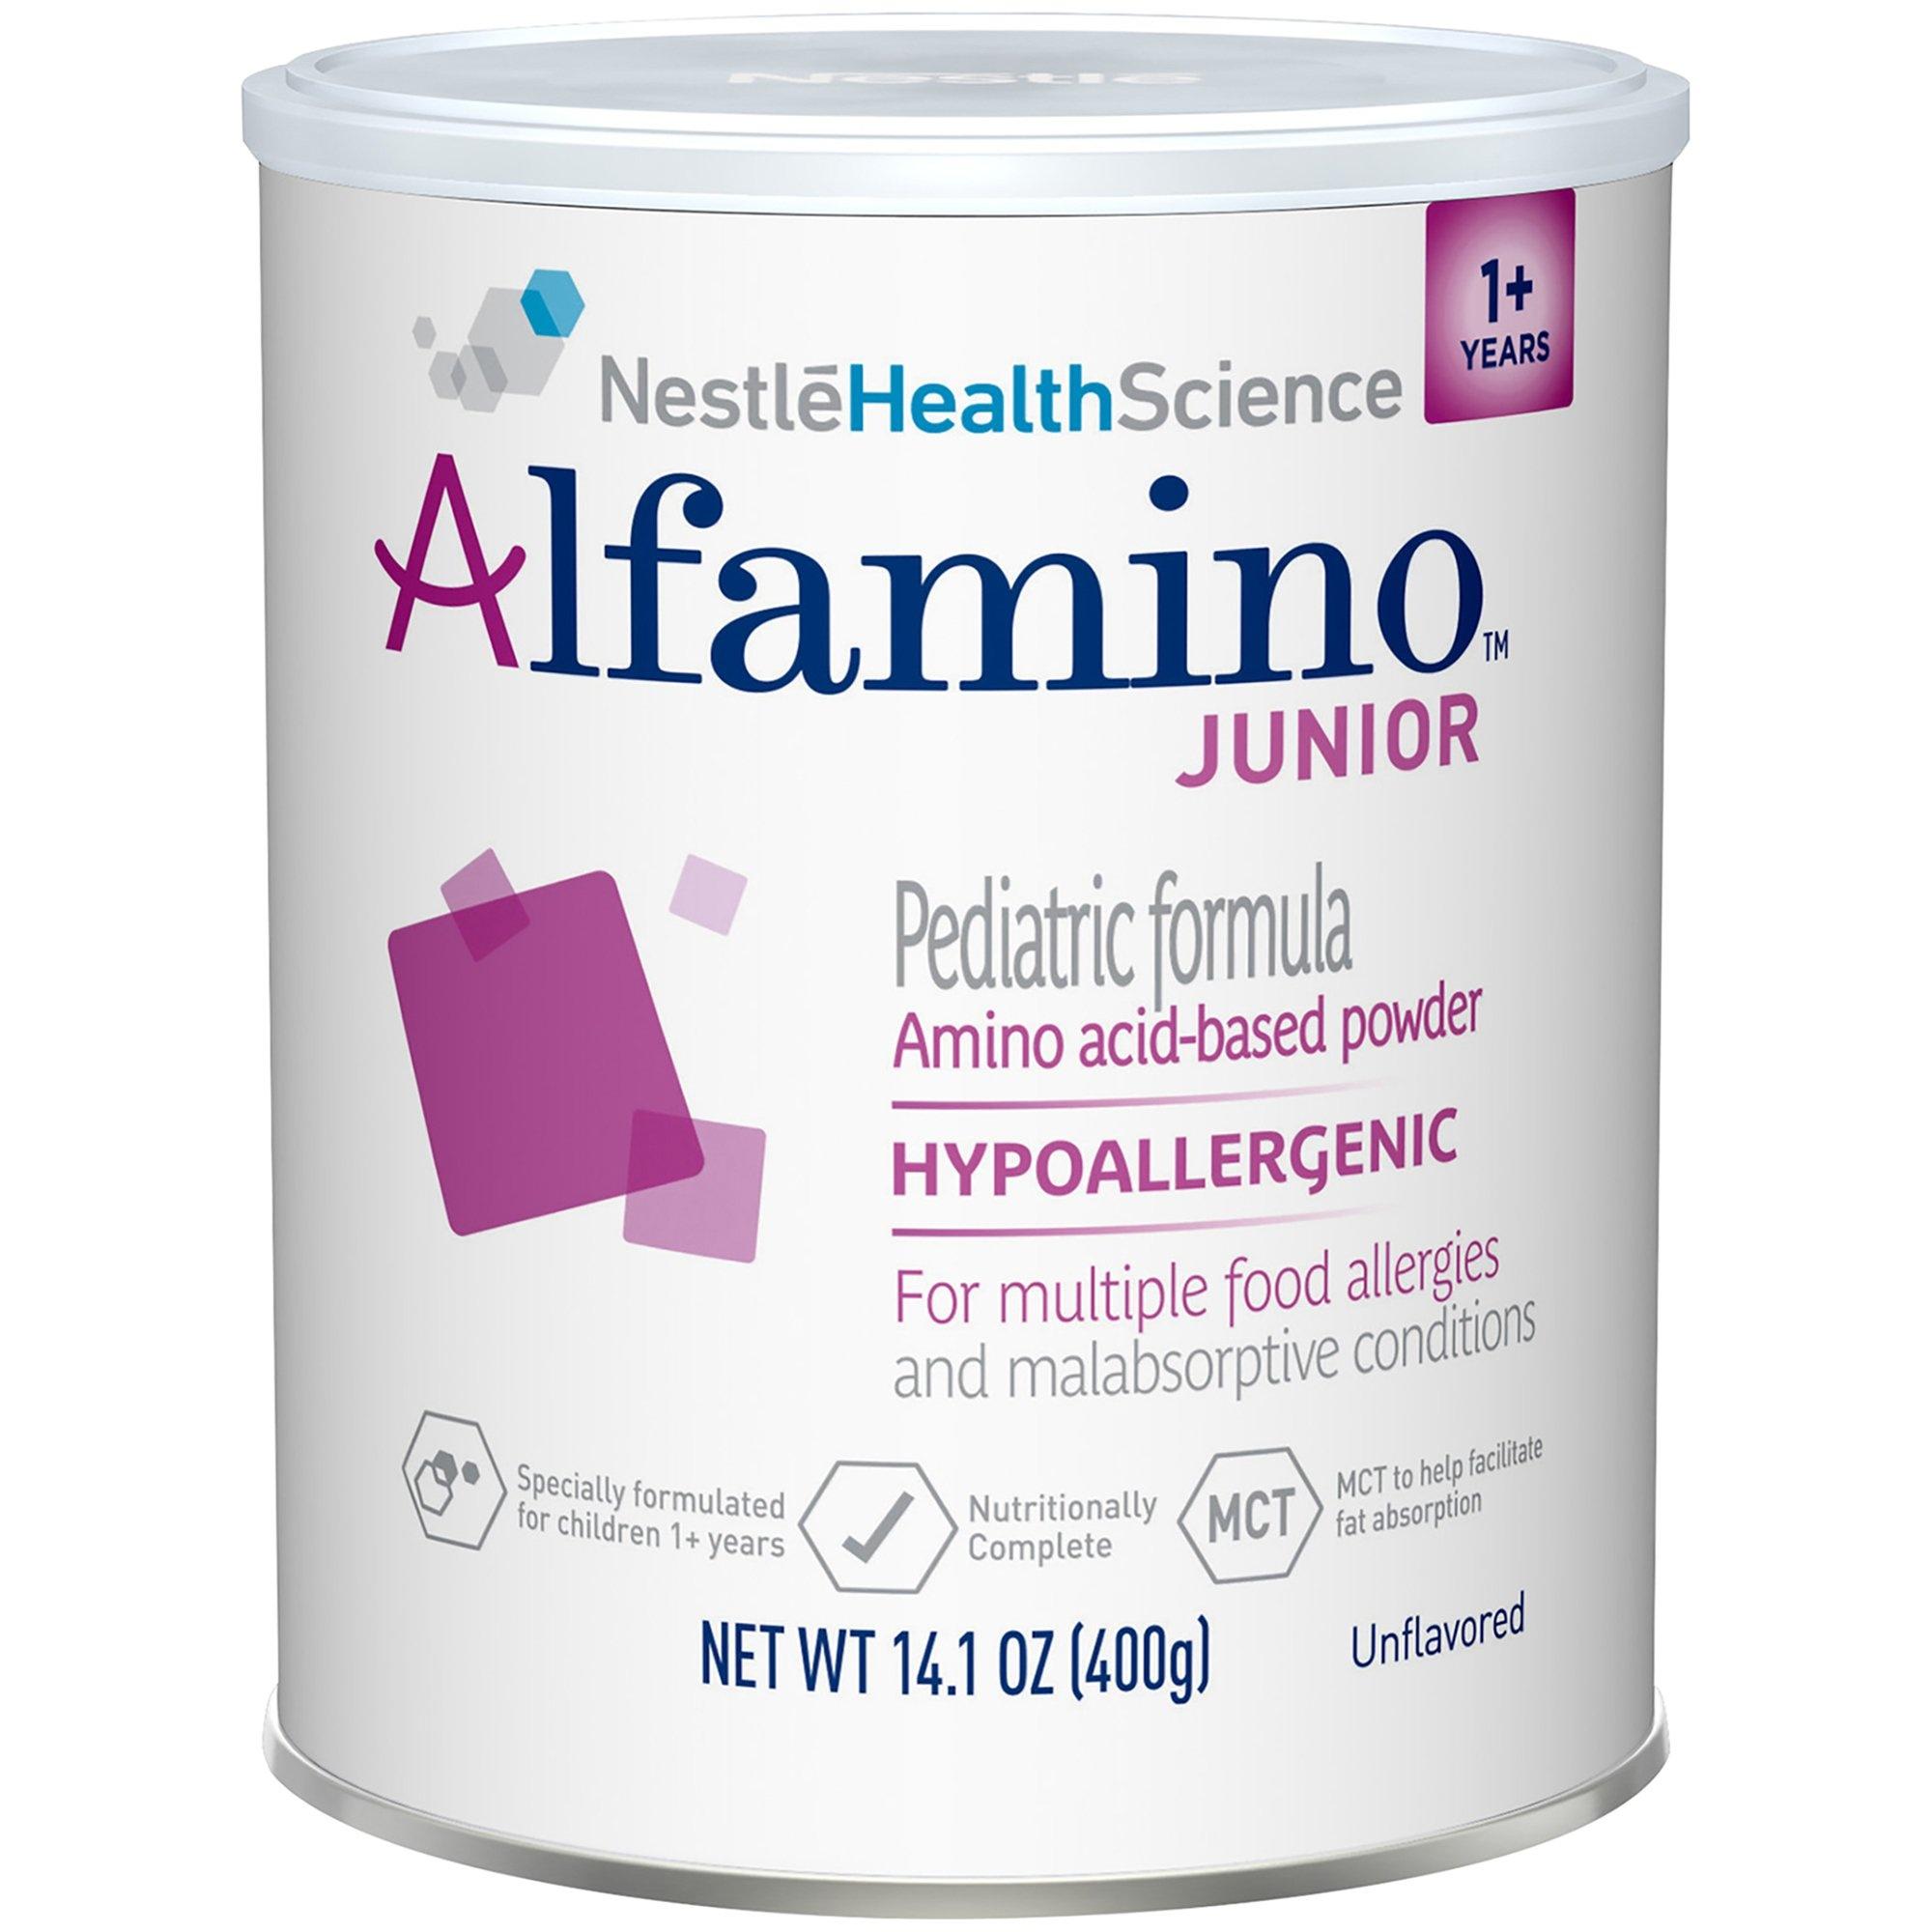 NestleHealthScience Alfamino Junior Pediatric Formula Amino Acid-Based Powder, 14.1 oz, 07613034787965, 1 Each